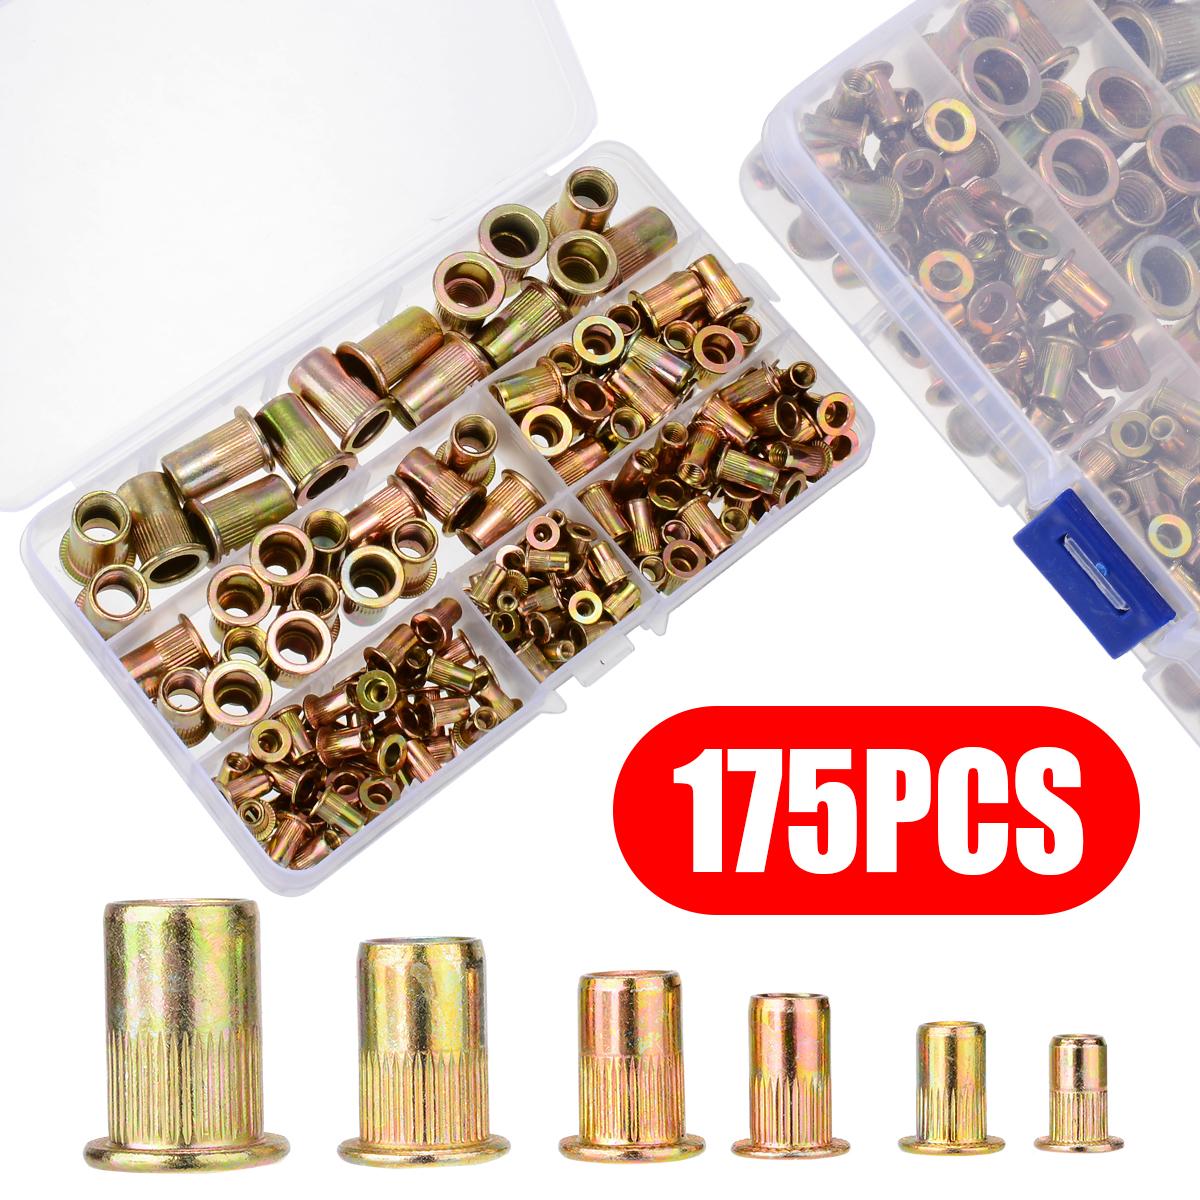 175pcs/kit Rivet Nut Kit Mixed Zinc Carbon Steel Rivnut Insert Nutsert Threaded M3 M4 M5 M6 M8 M10 Nutsert Cap